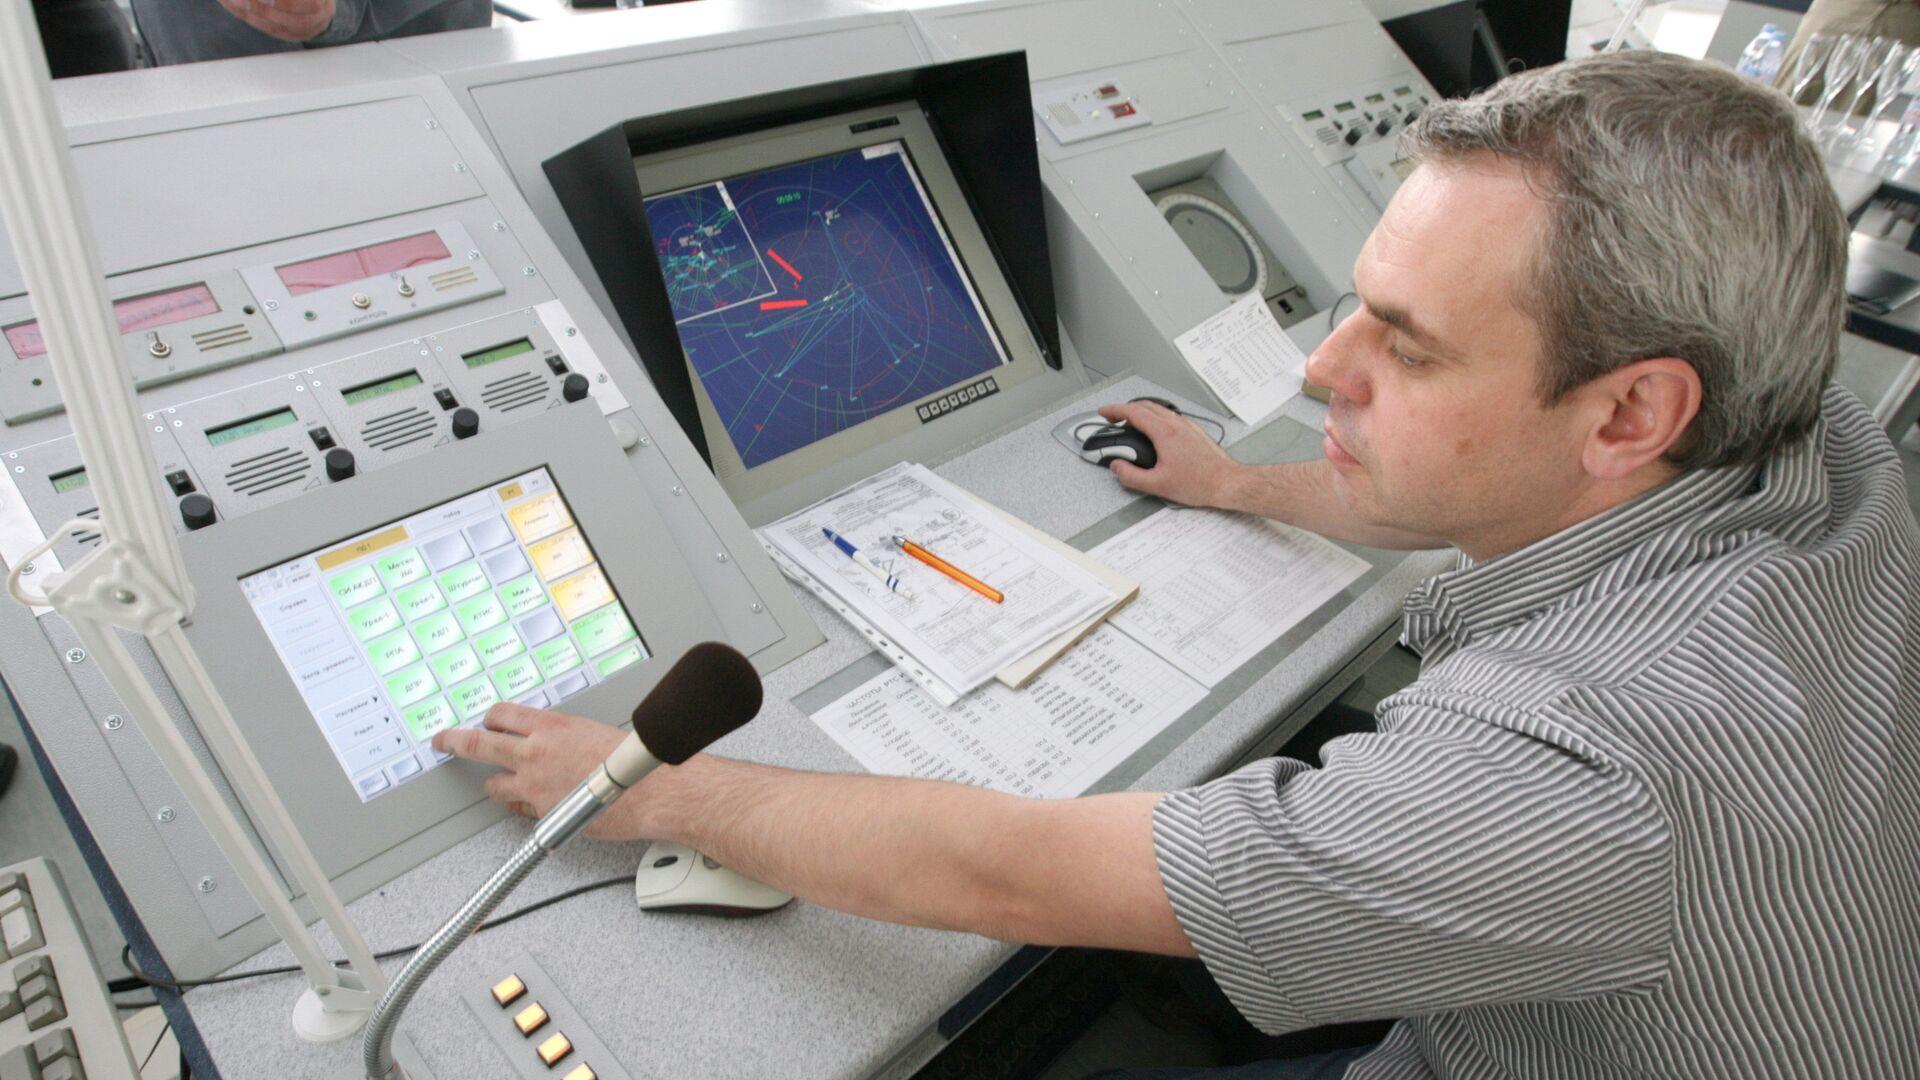 Работа авиадиспетчера - РИА Новости, 1920, 25.01.2021